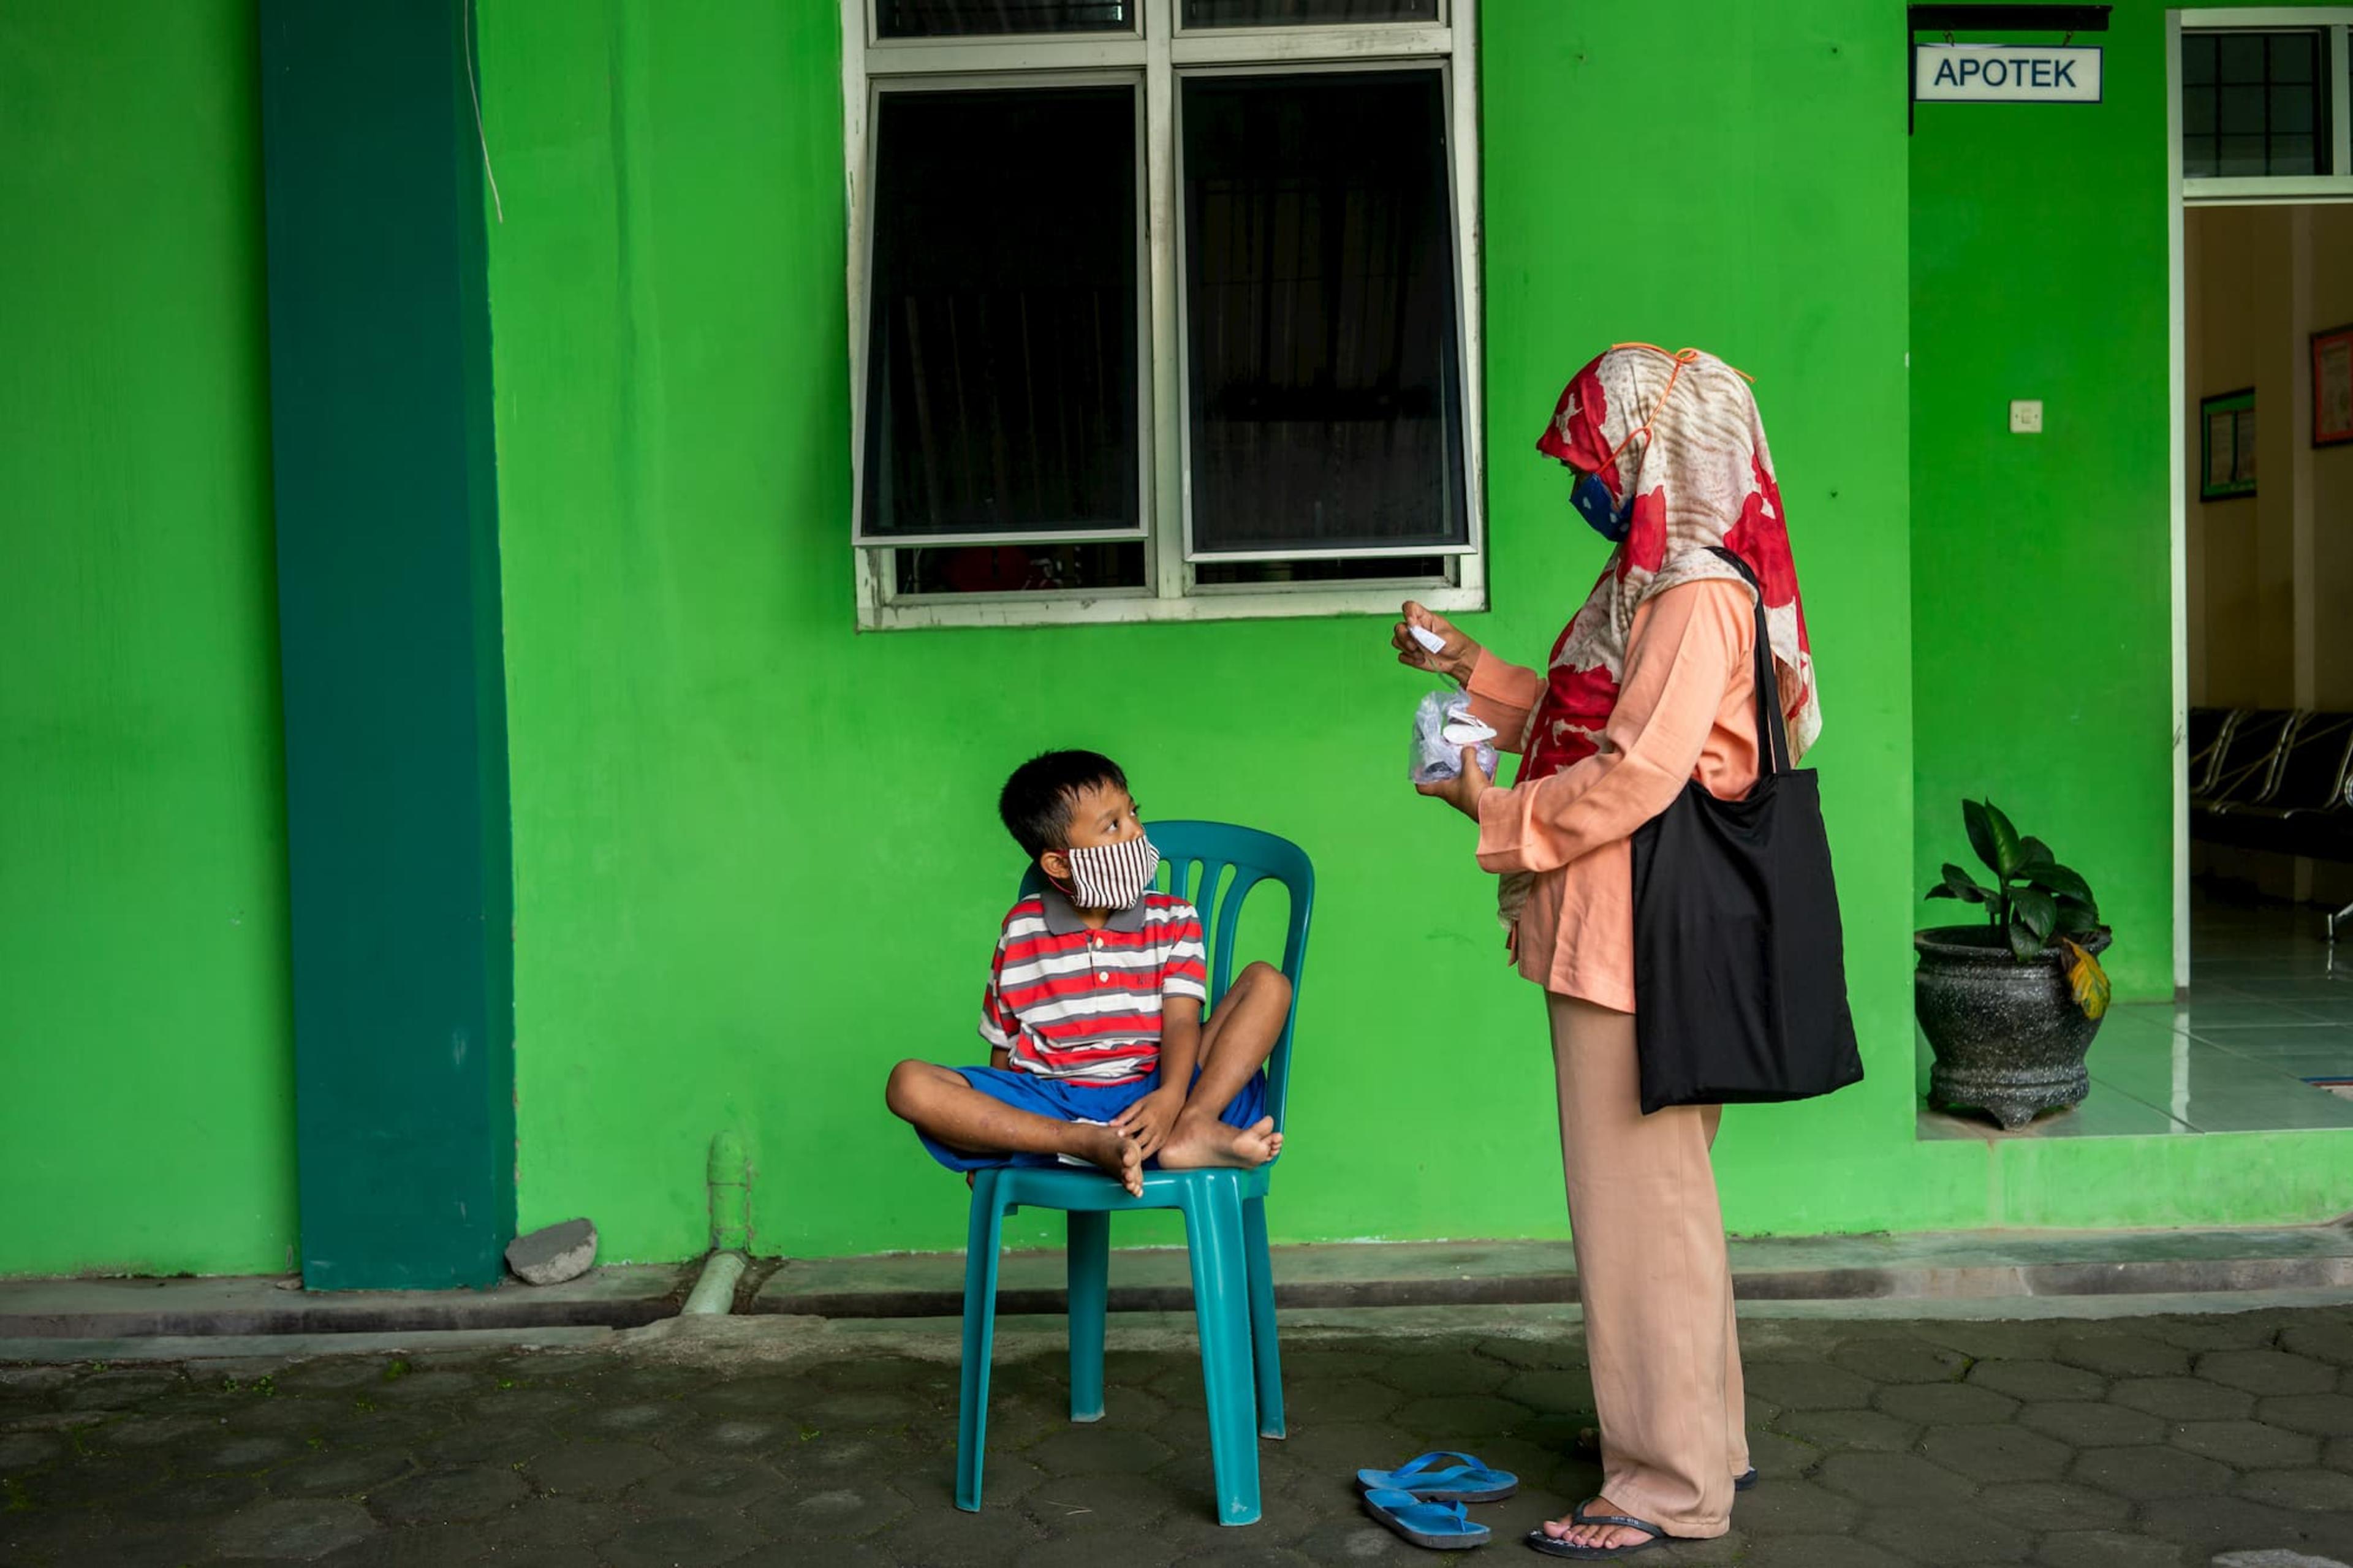 Covid-19 Indonesia response